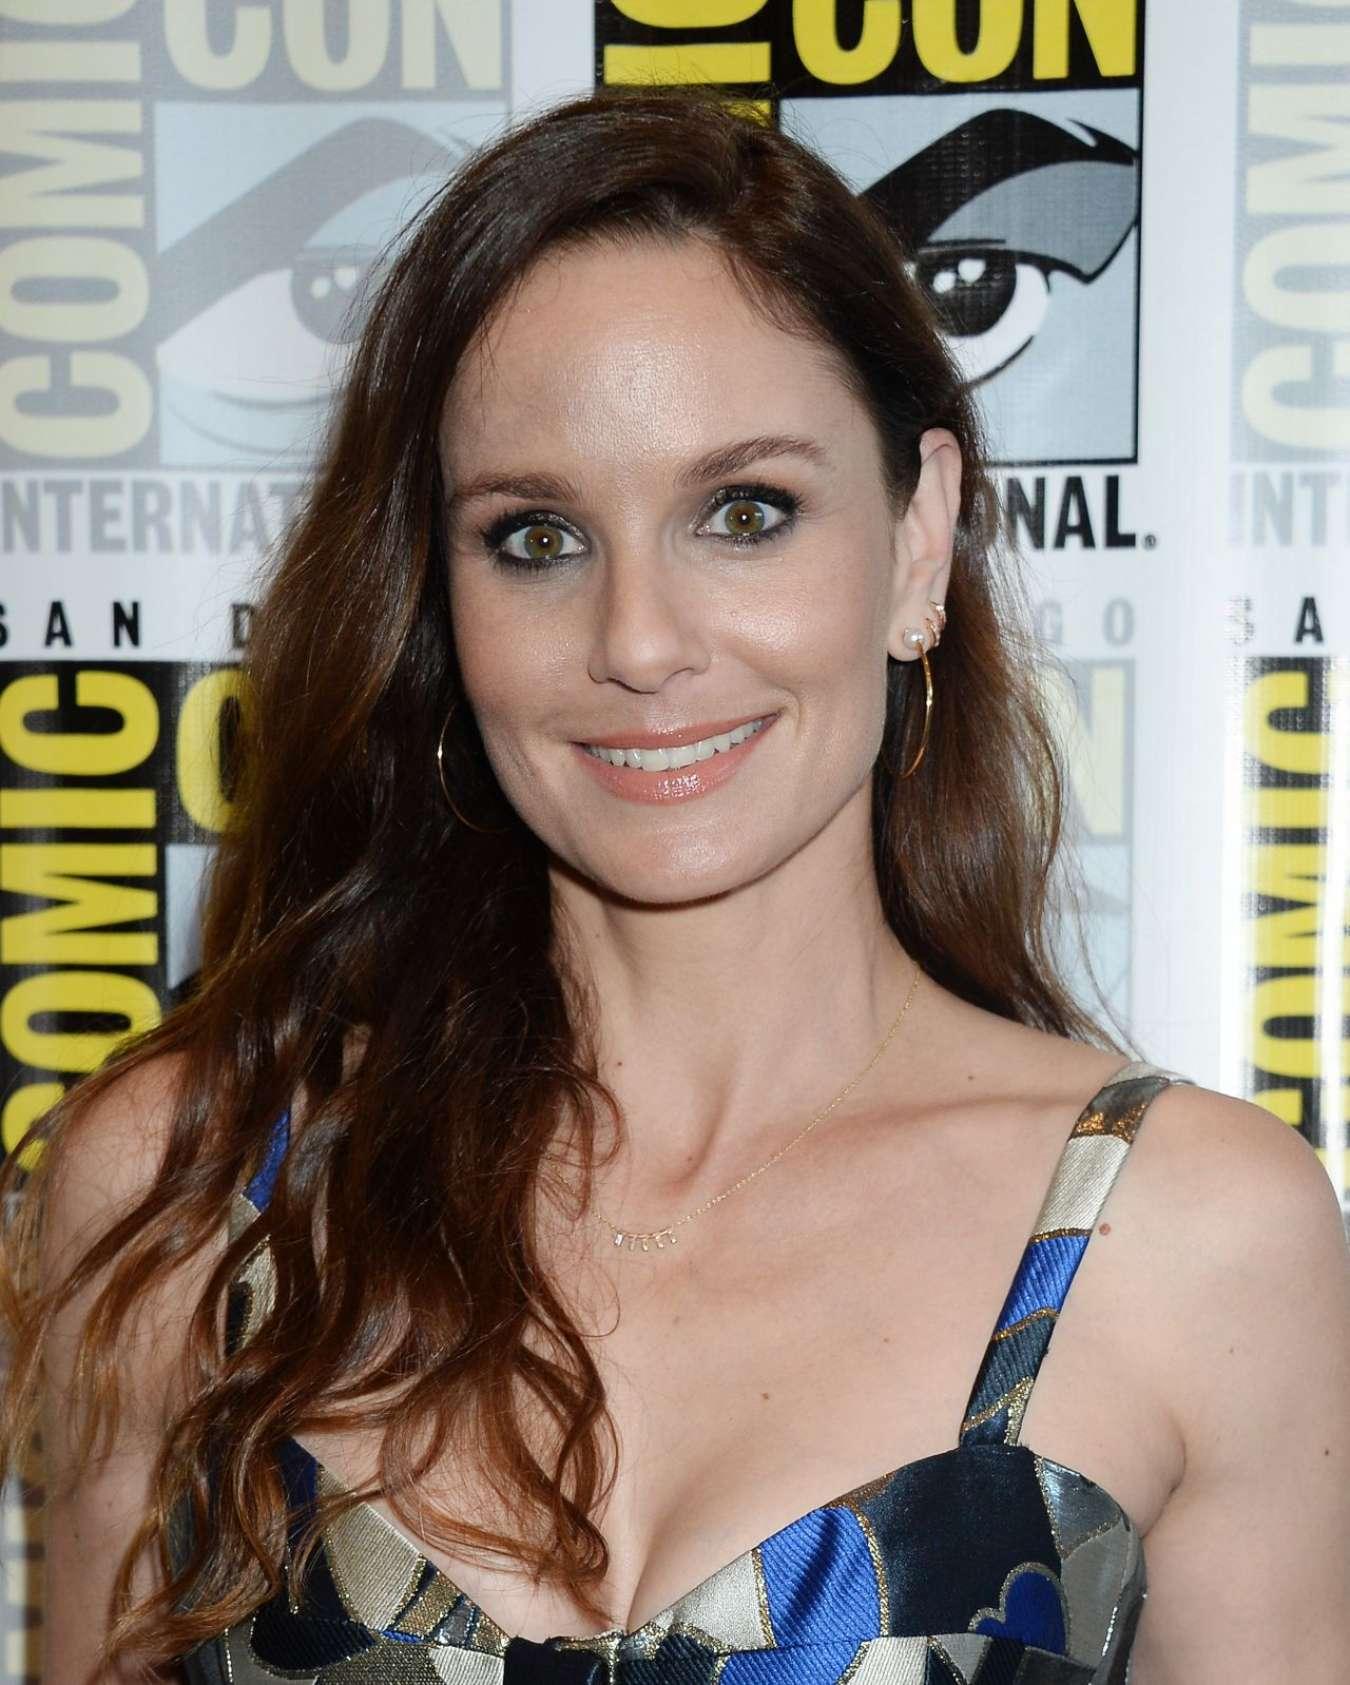 ¿Cuánto mide Sarah Wayne Callies? - Real height Sarah-Wayne-Callies:-Colony-Press-Line-at-2017-Comic-Con-in-San-Diego--01